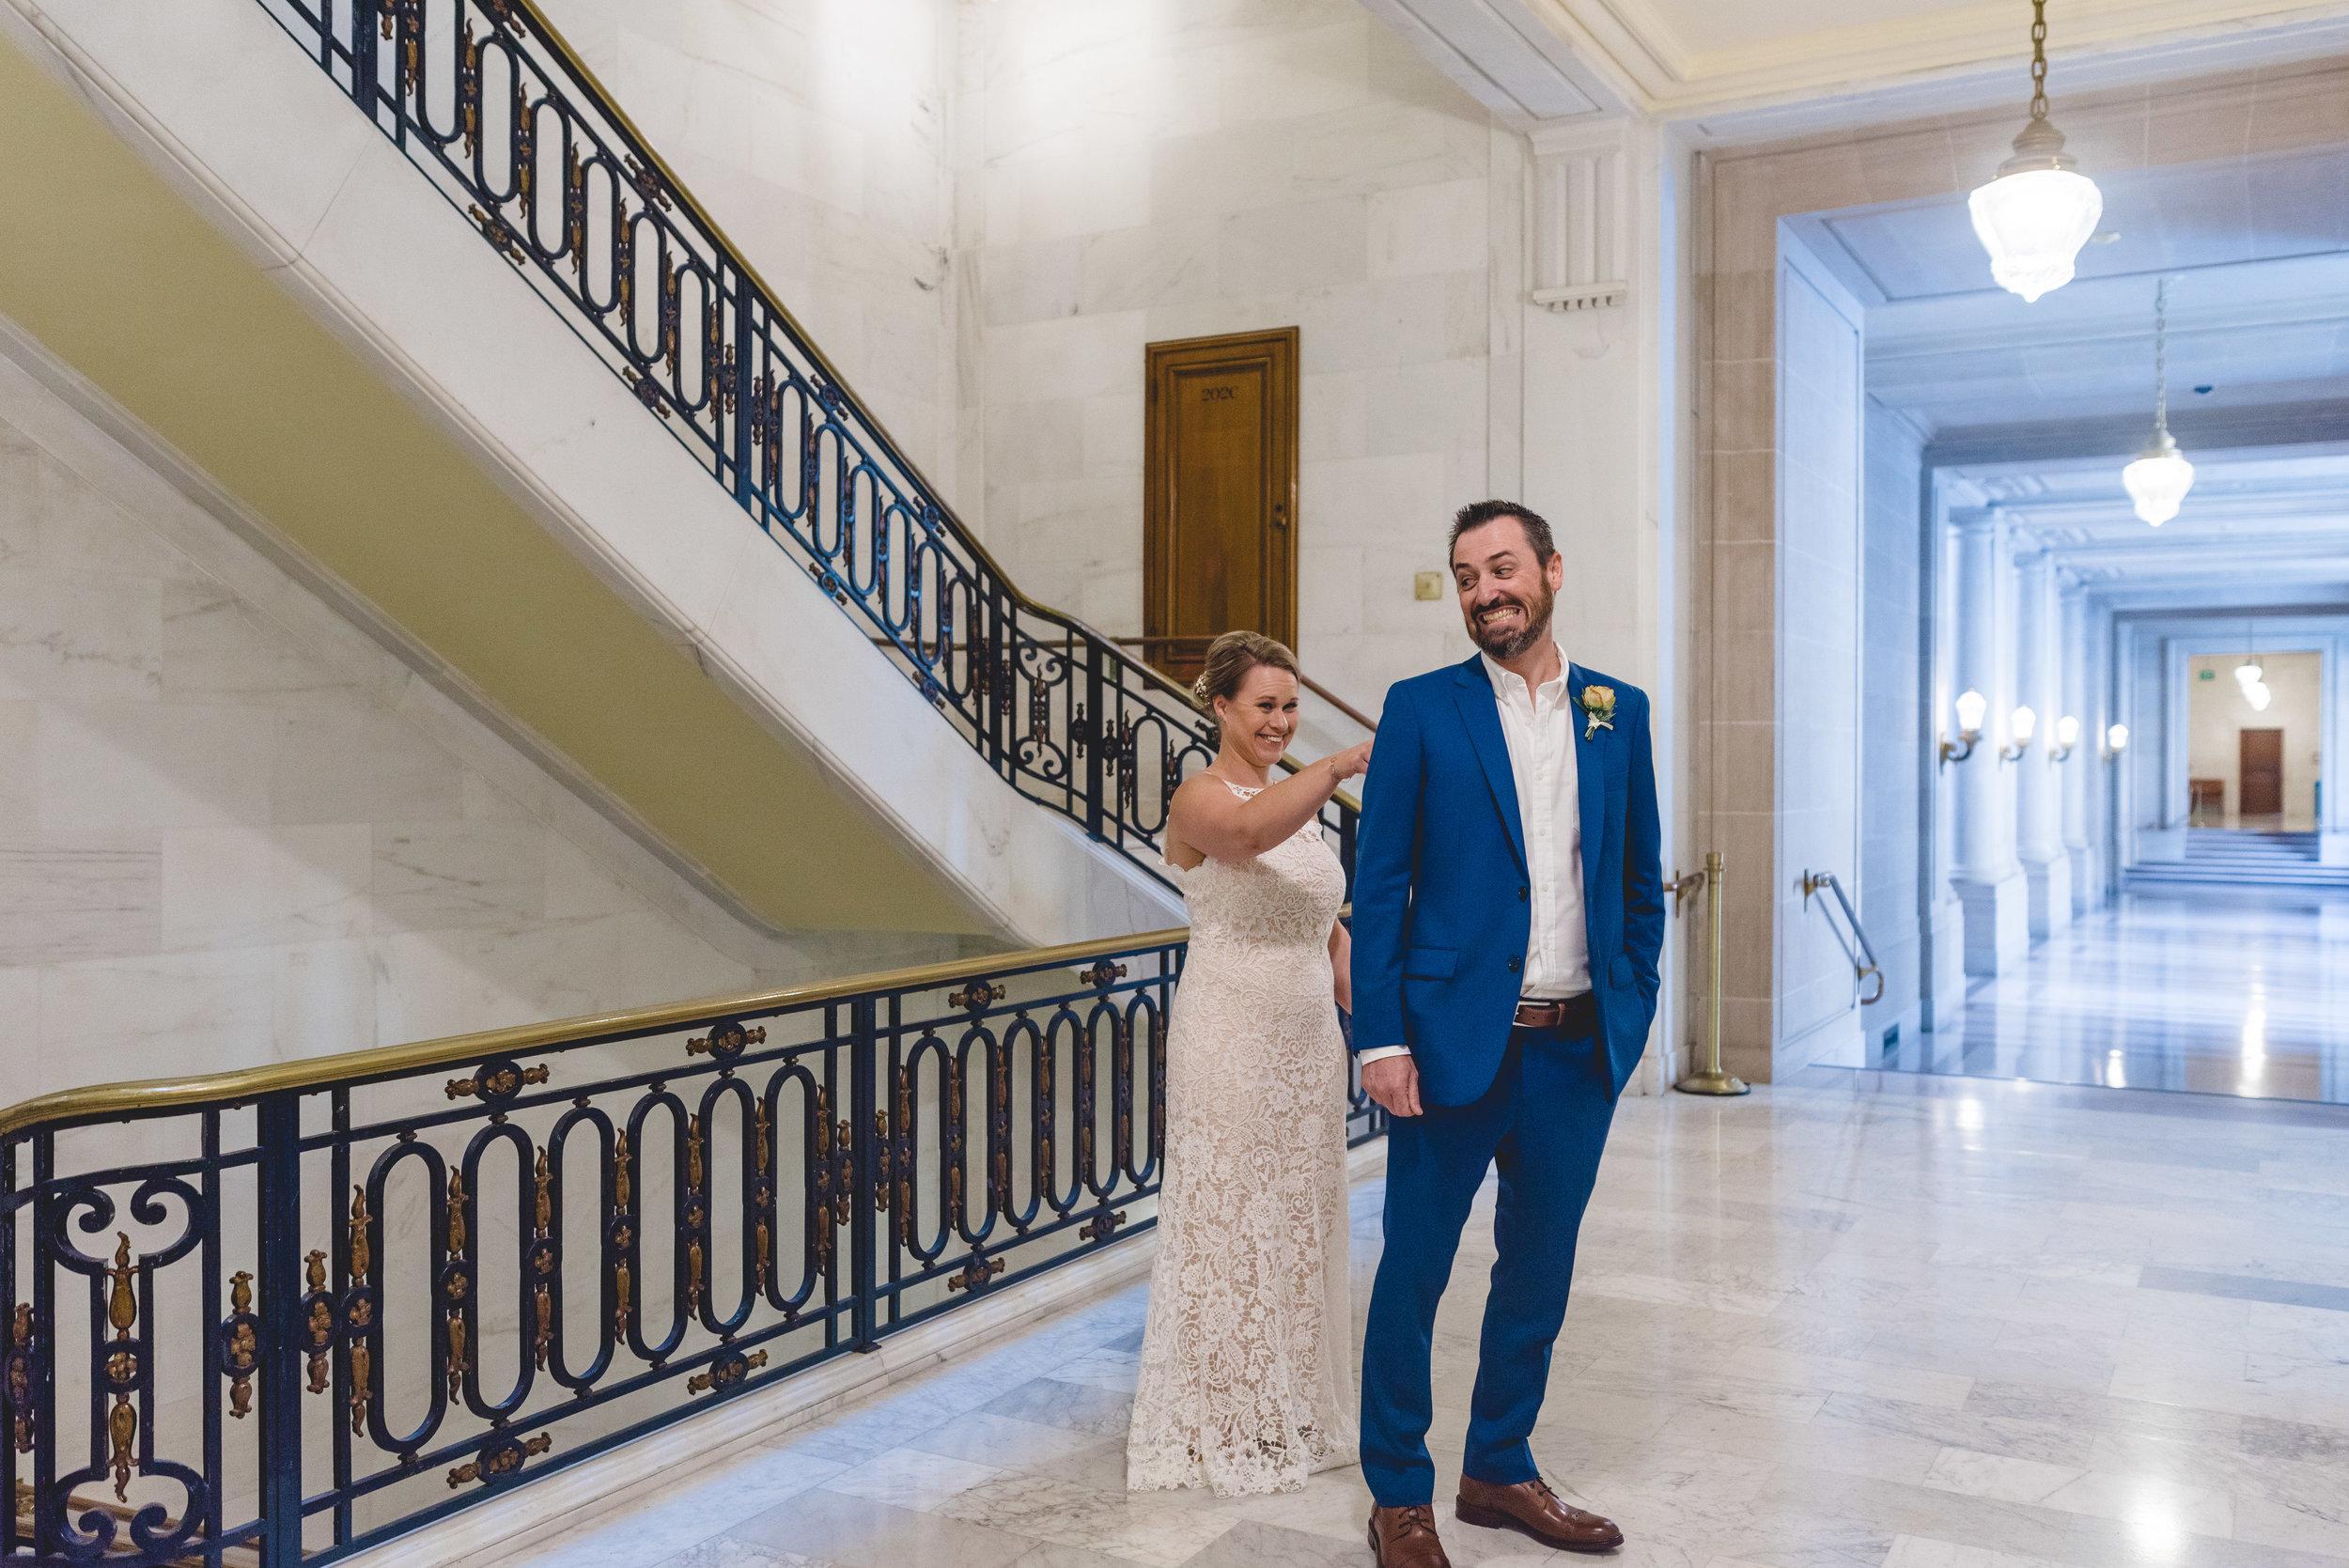 mcdaniels_conroy-wedding-couple-20.jpg